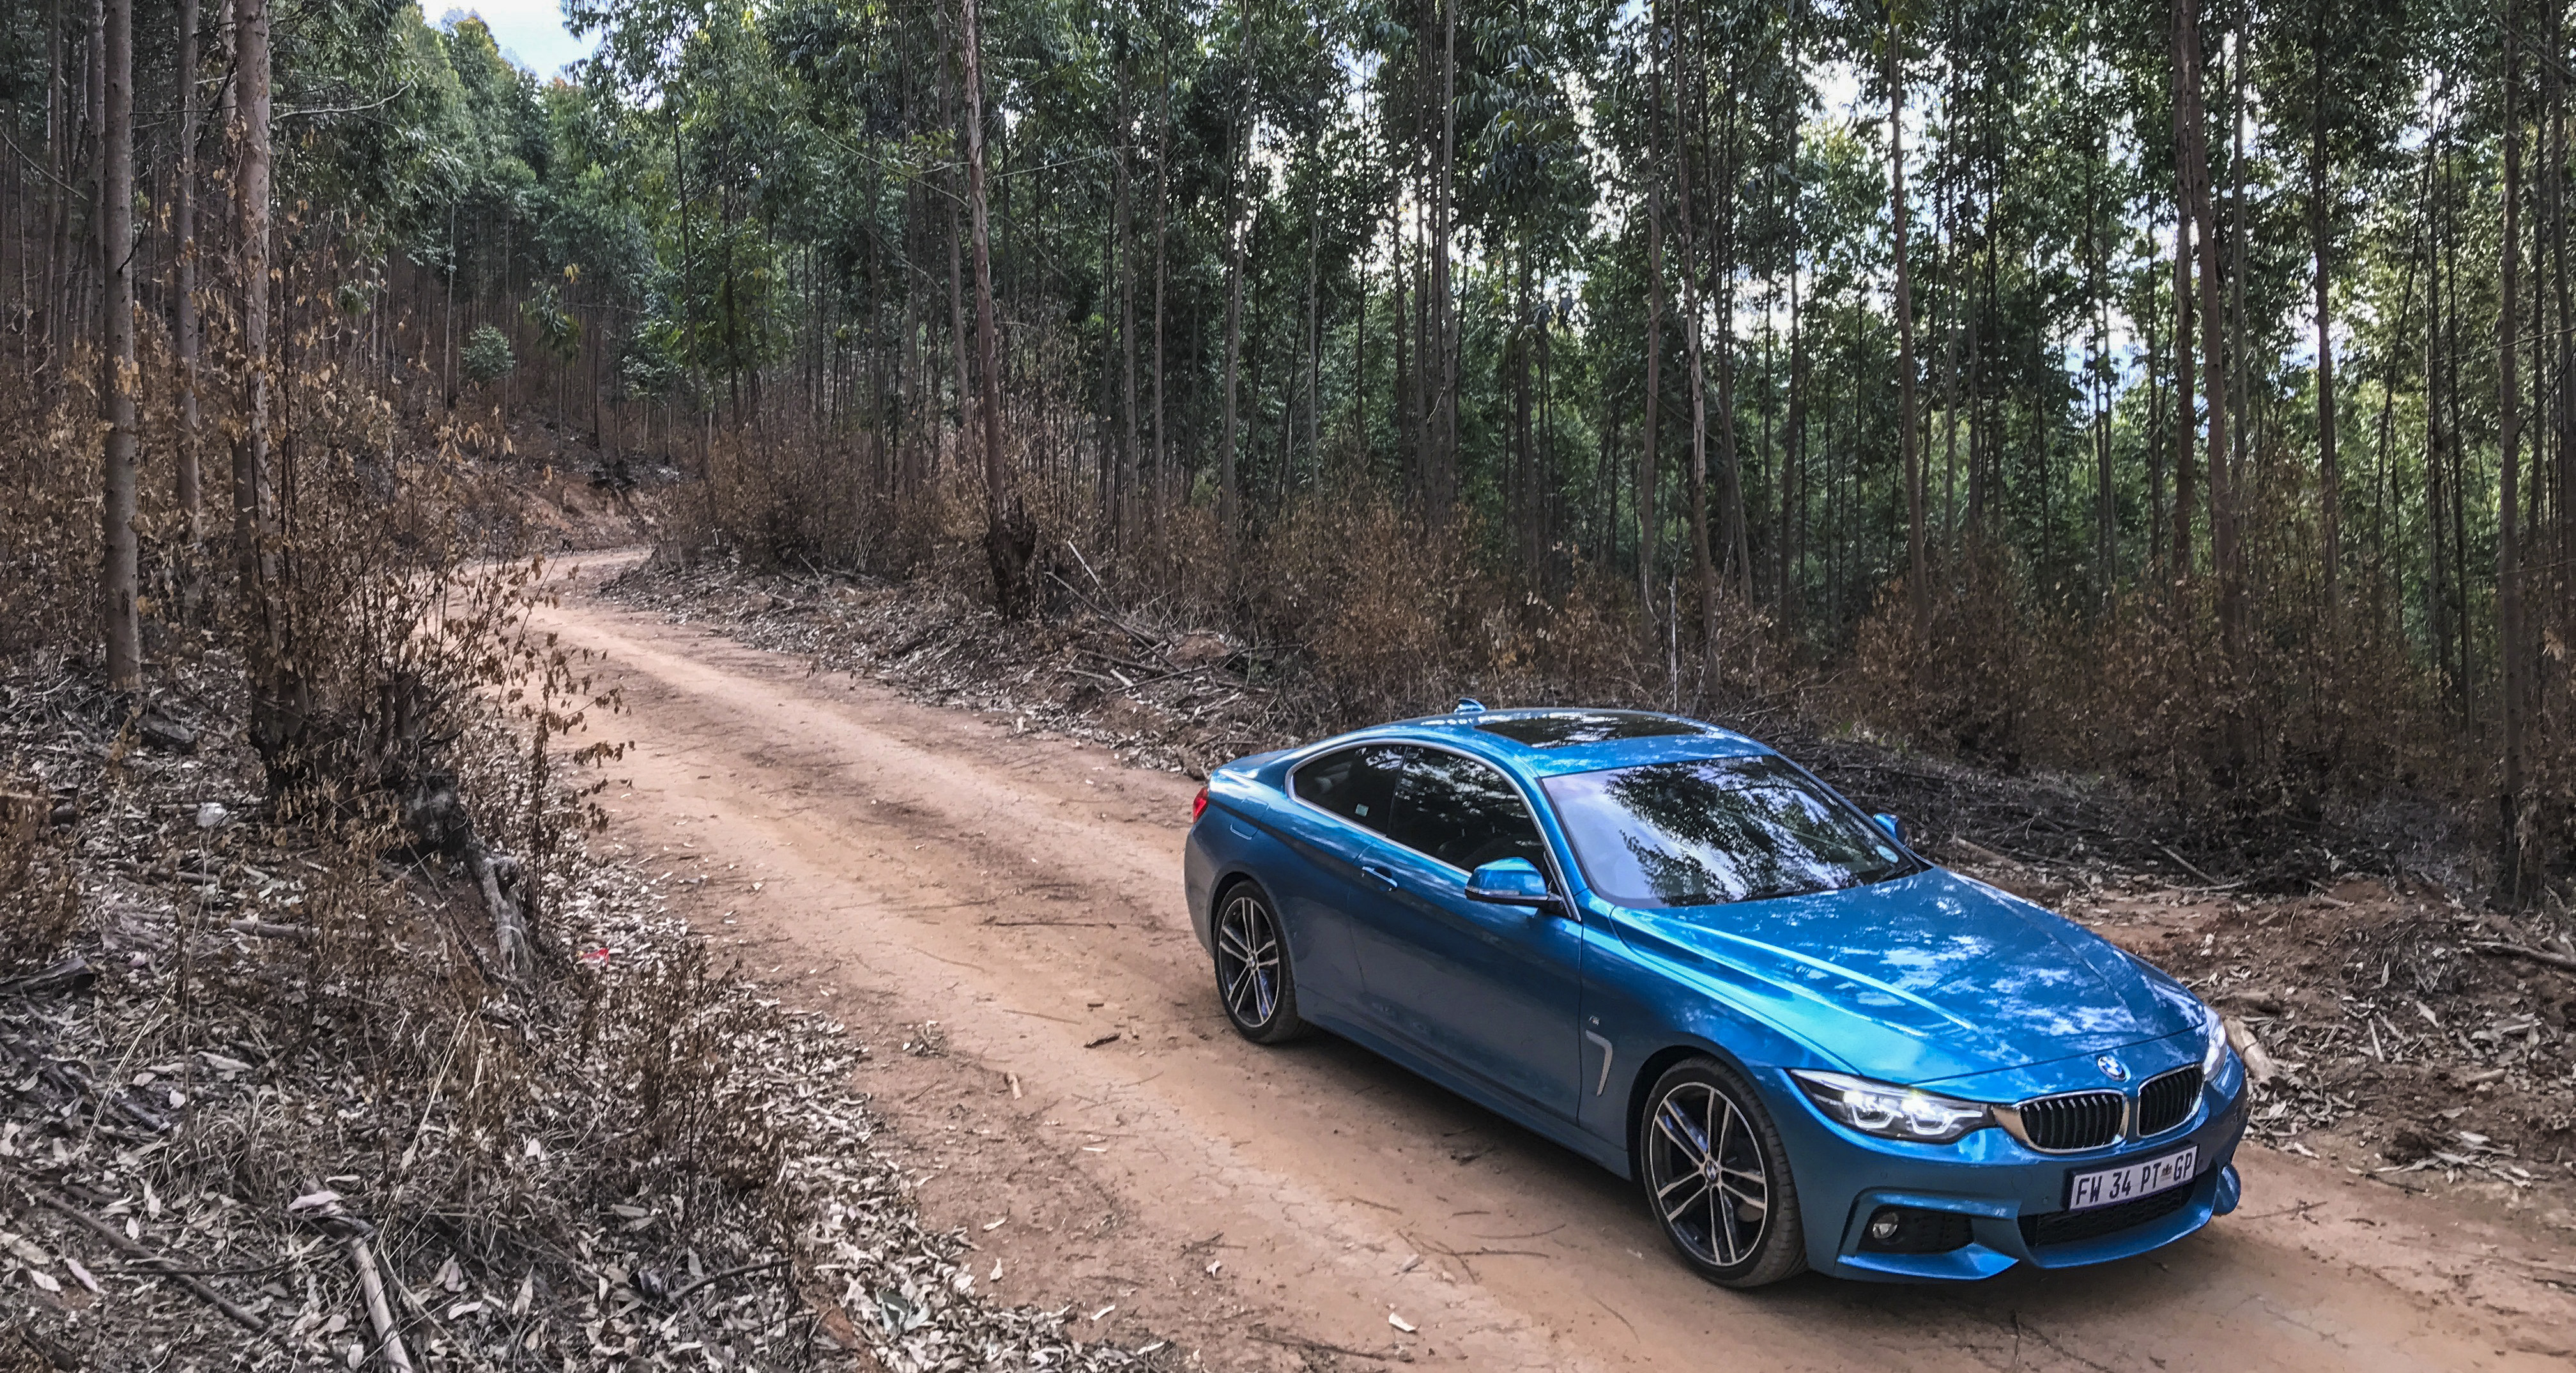 We drive the BMW 4-Series LCI update